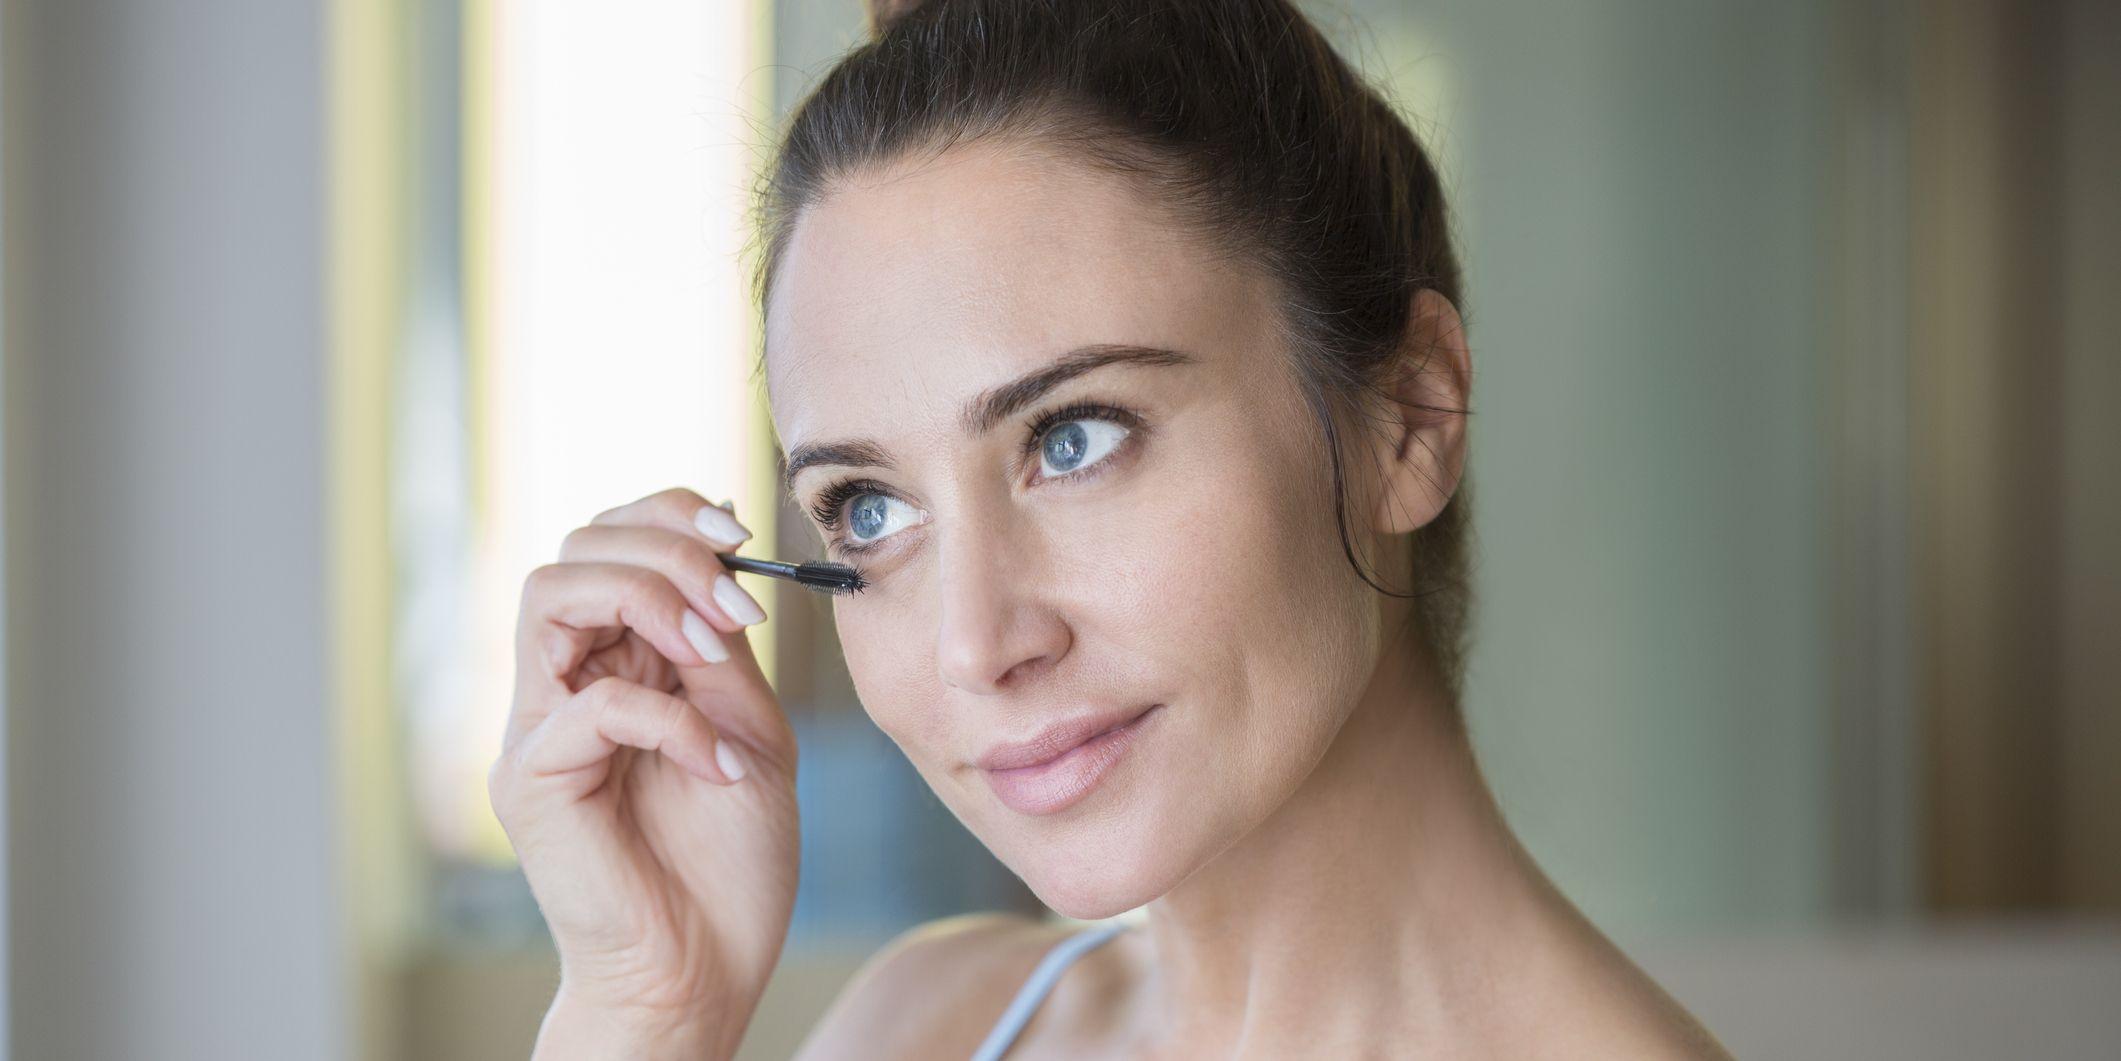 Mid adult woman applying mascara.